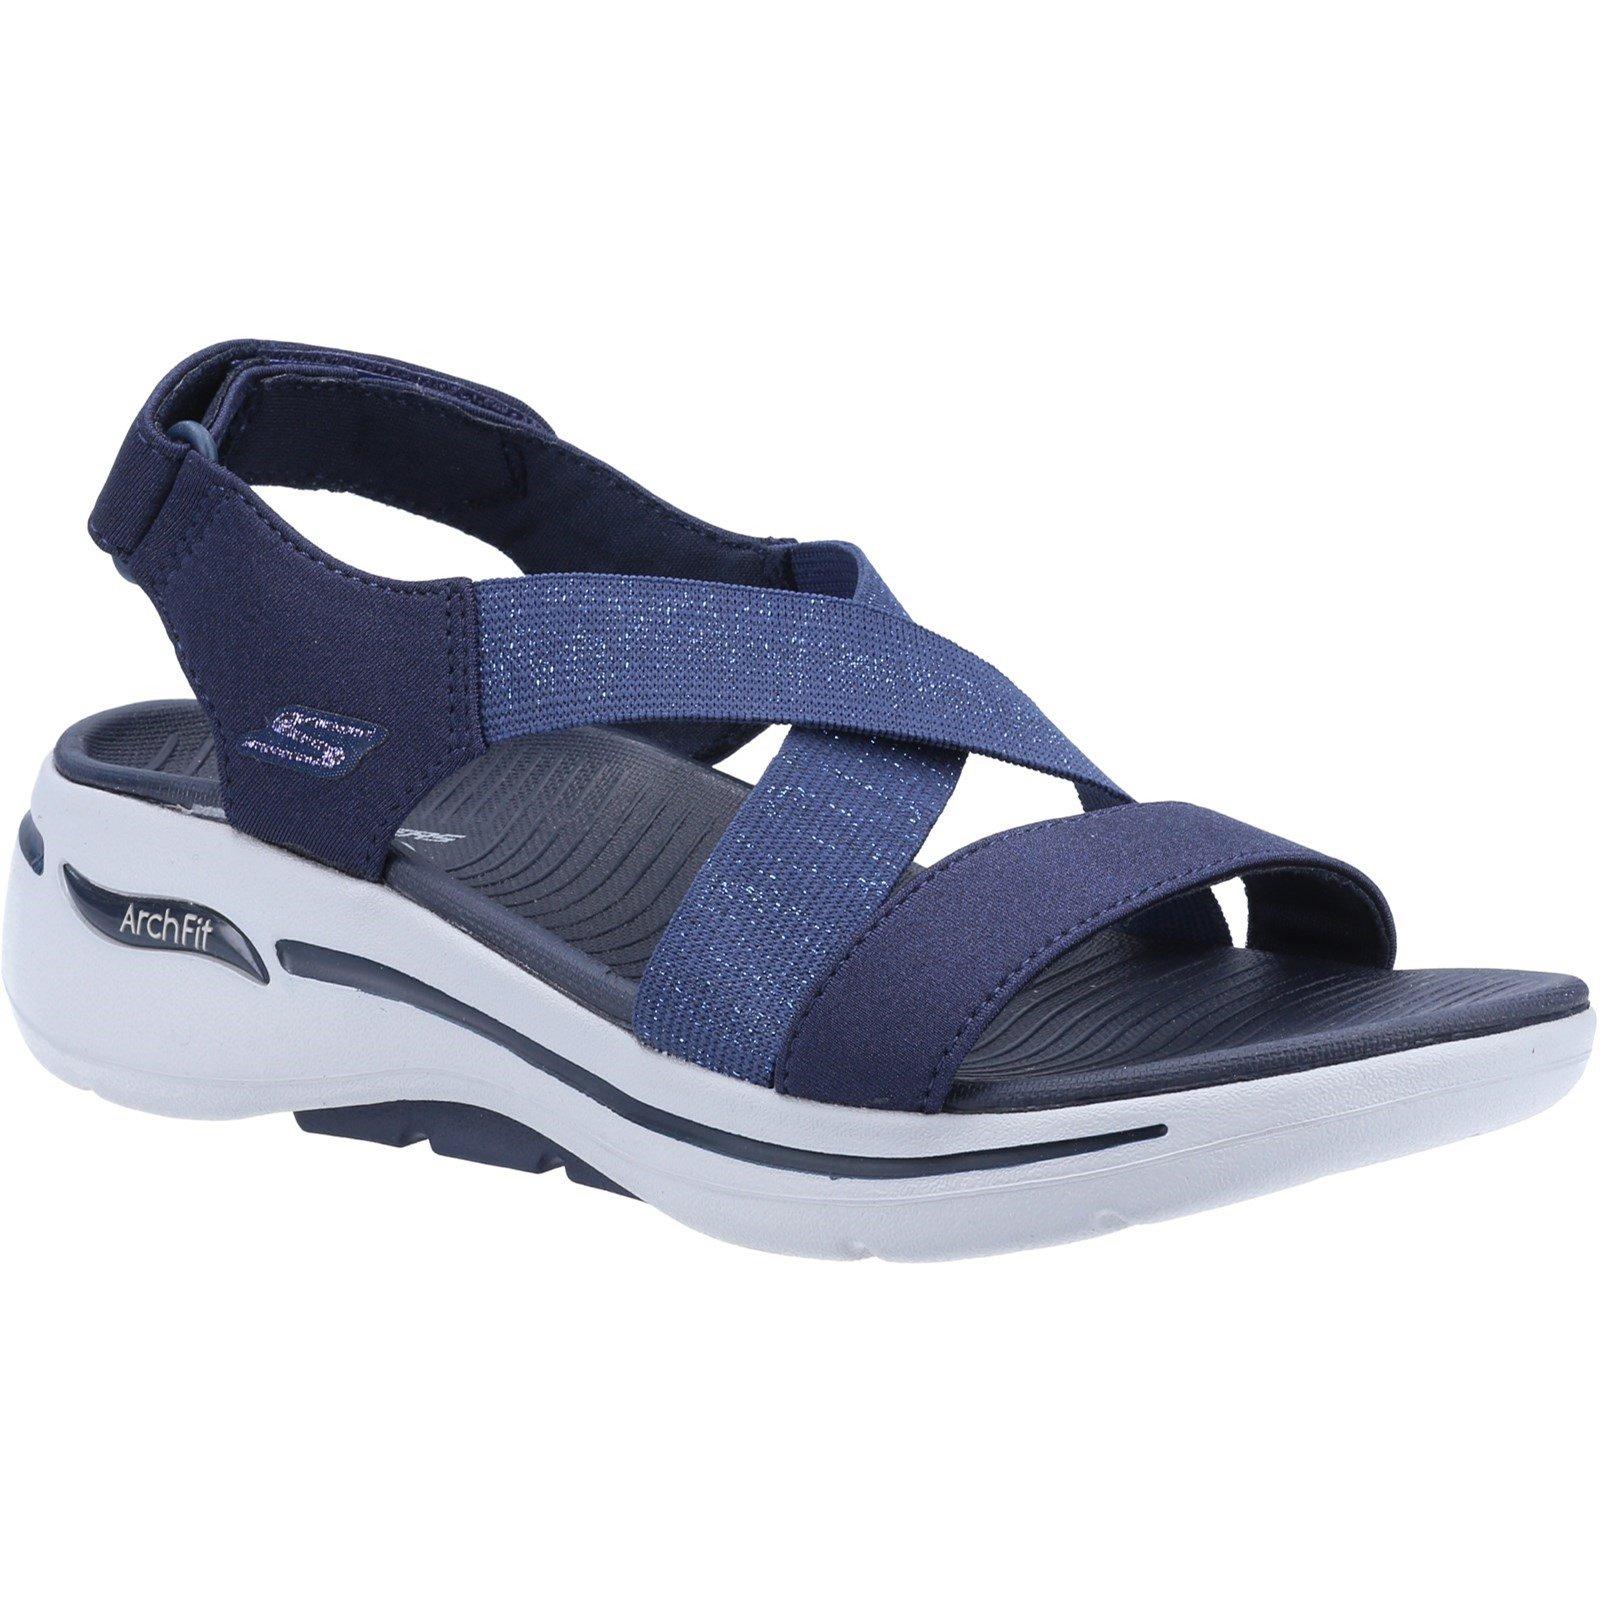 Skechers Women's Go Walk Arch Fit Astonish Summer Sandal Various Colours 32153 - Navy 4